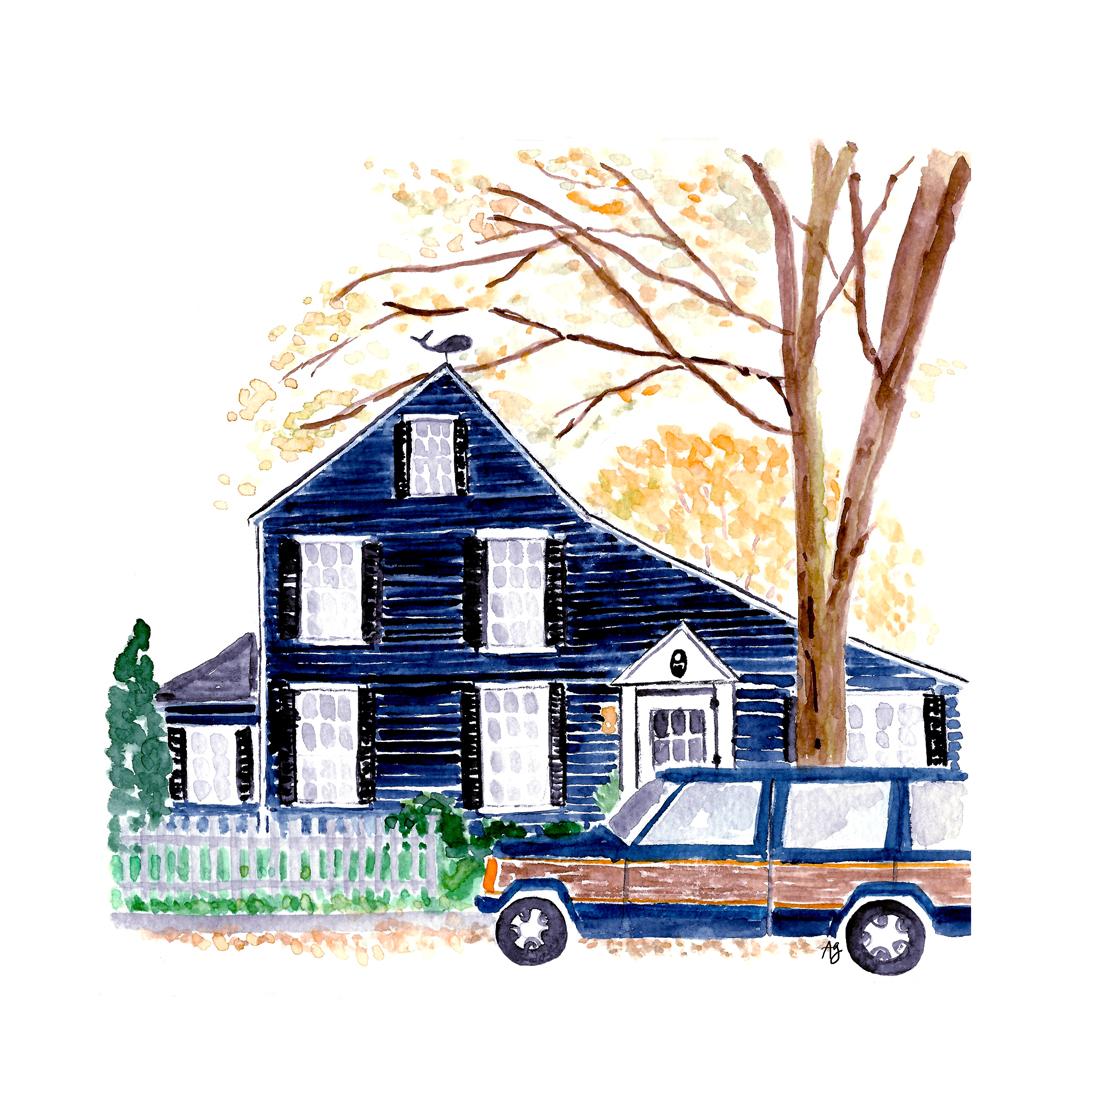 Home Illustration •original photo by Jackie Greaney • amandagomes.com